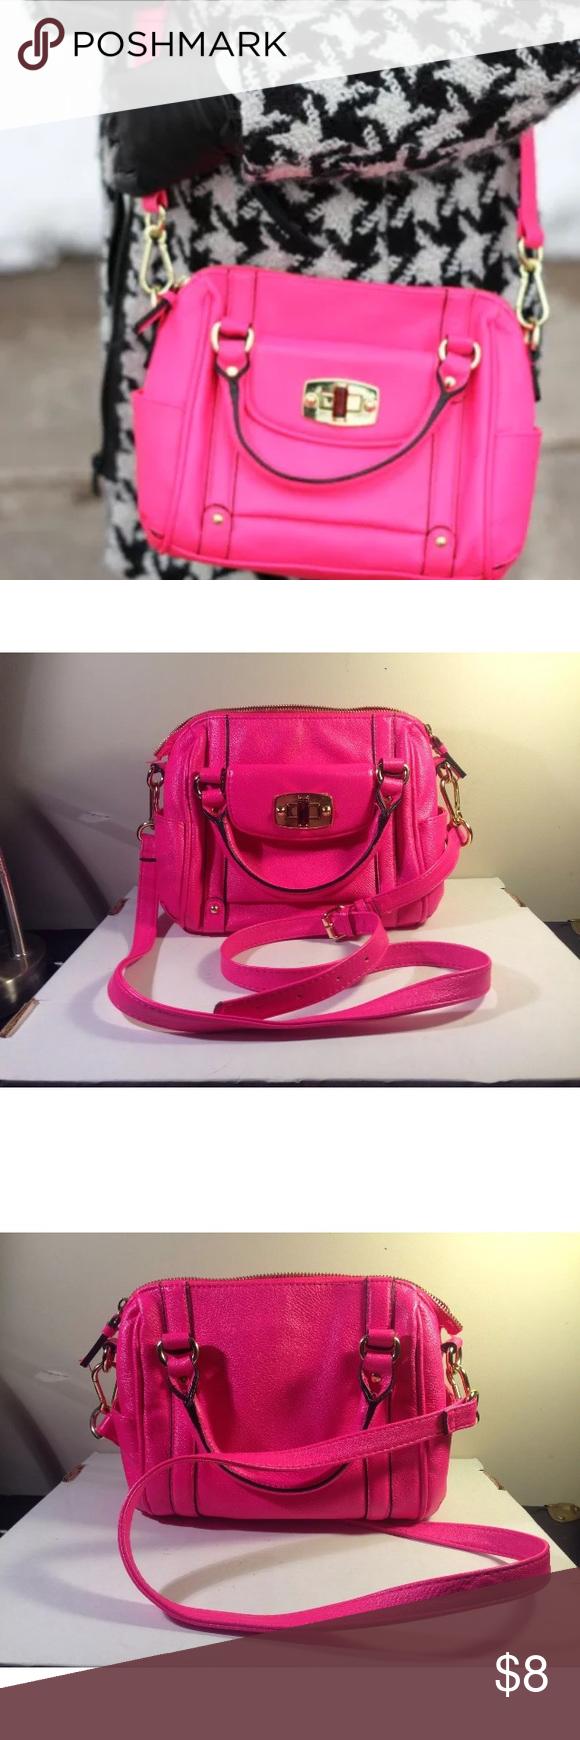 6f771ac2f2 MERONA Hot Neon So Pink Mini Purse Bag BAD ZIPPER MERONA Hot Neon So Pink  Mini